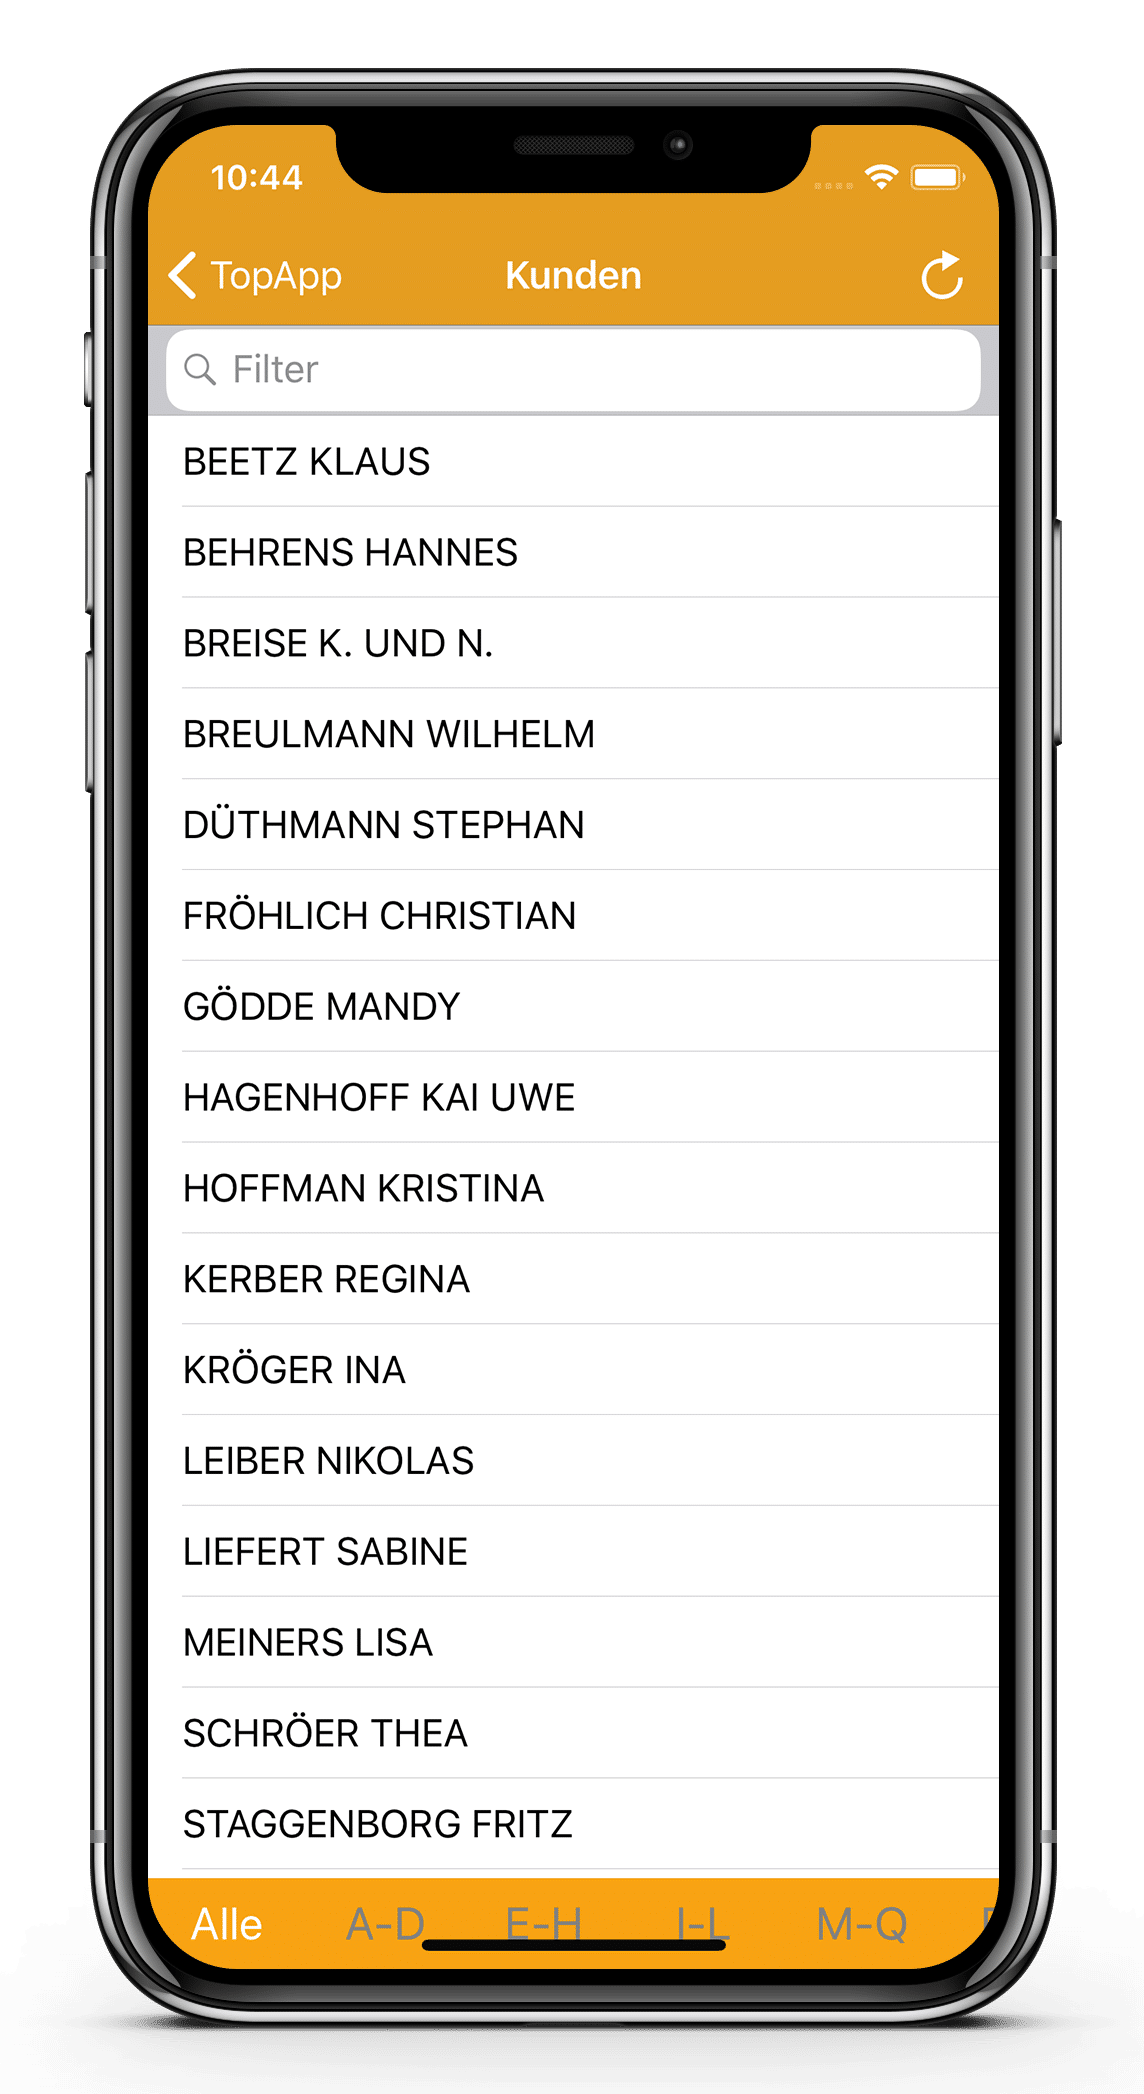 TopApp - iPhone X